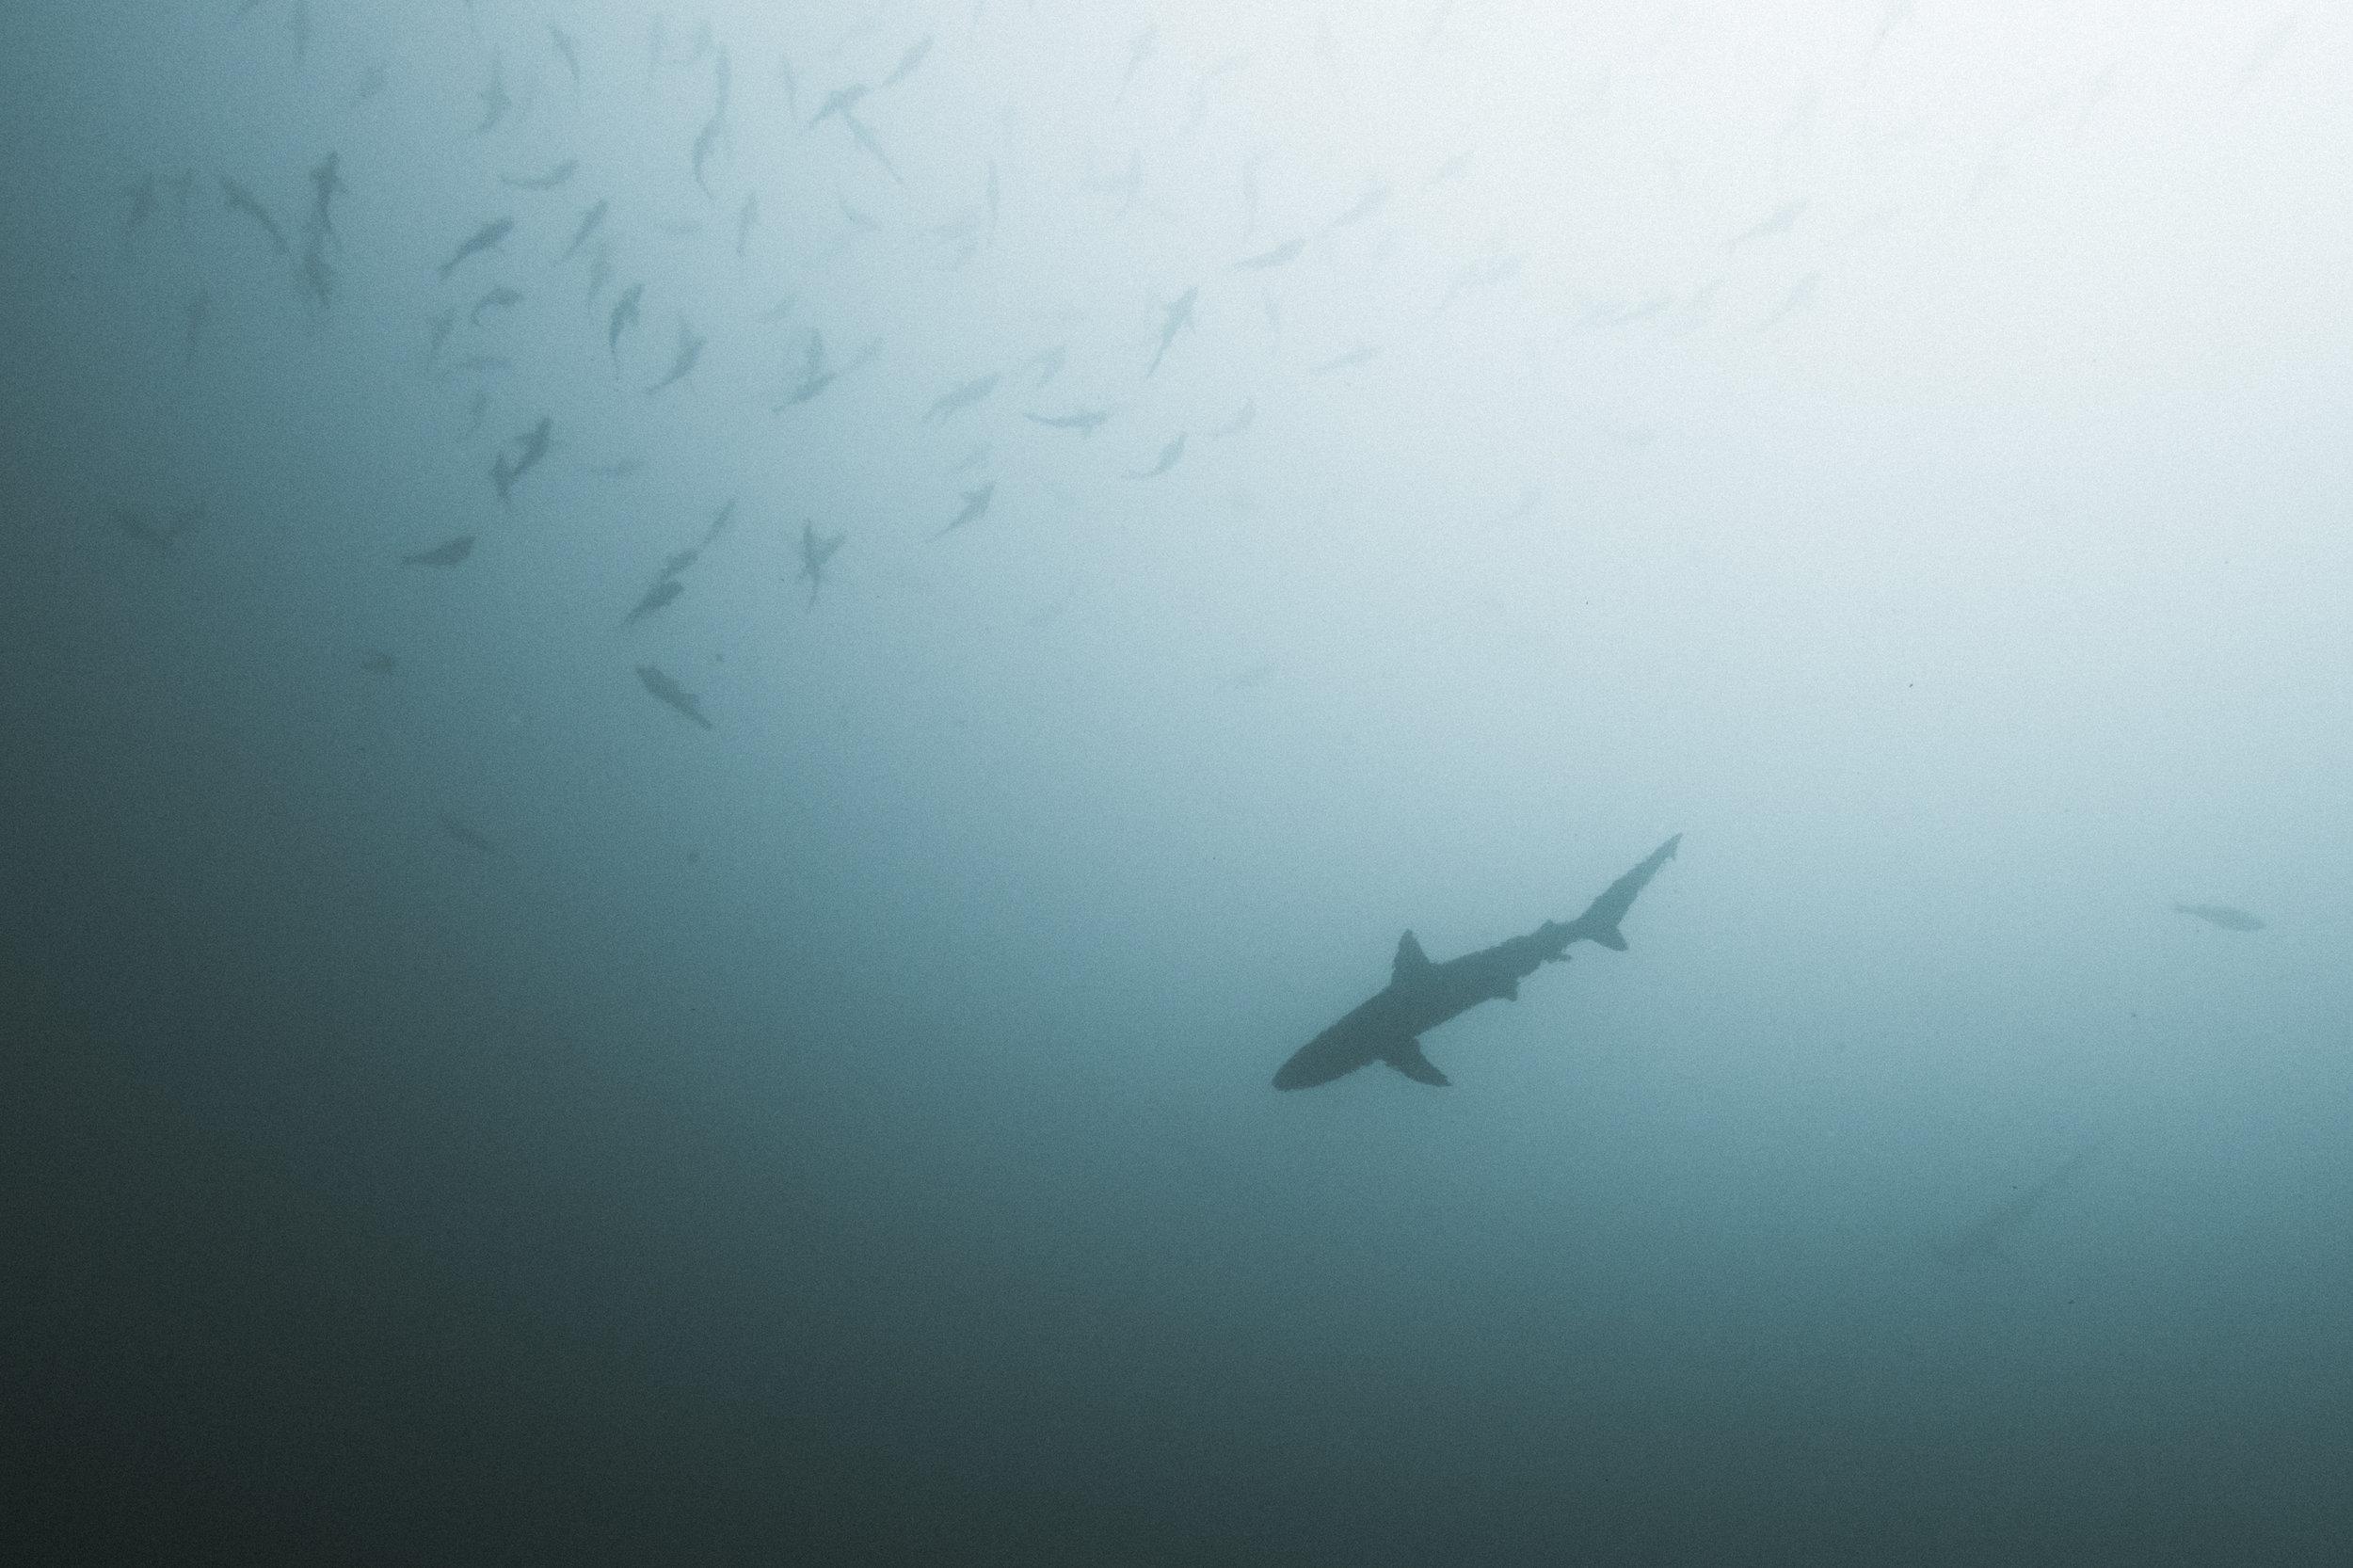 Blacktip reef shark (Carcharhinus melanopterus) - Blacktip reef shark sillouteed with a school of fish at the Gordon Rocks dive site off the coast of Santa Cruz Island.